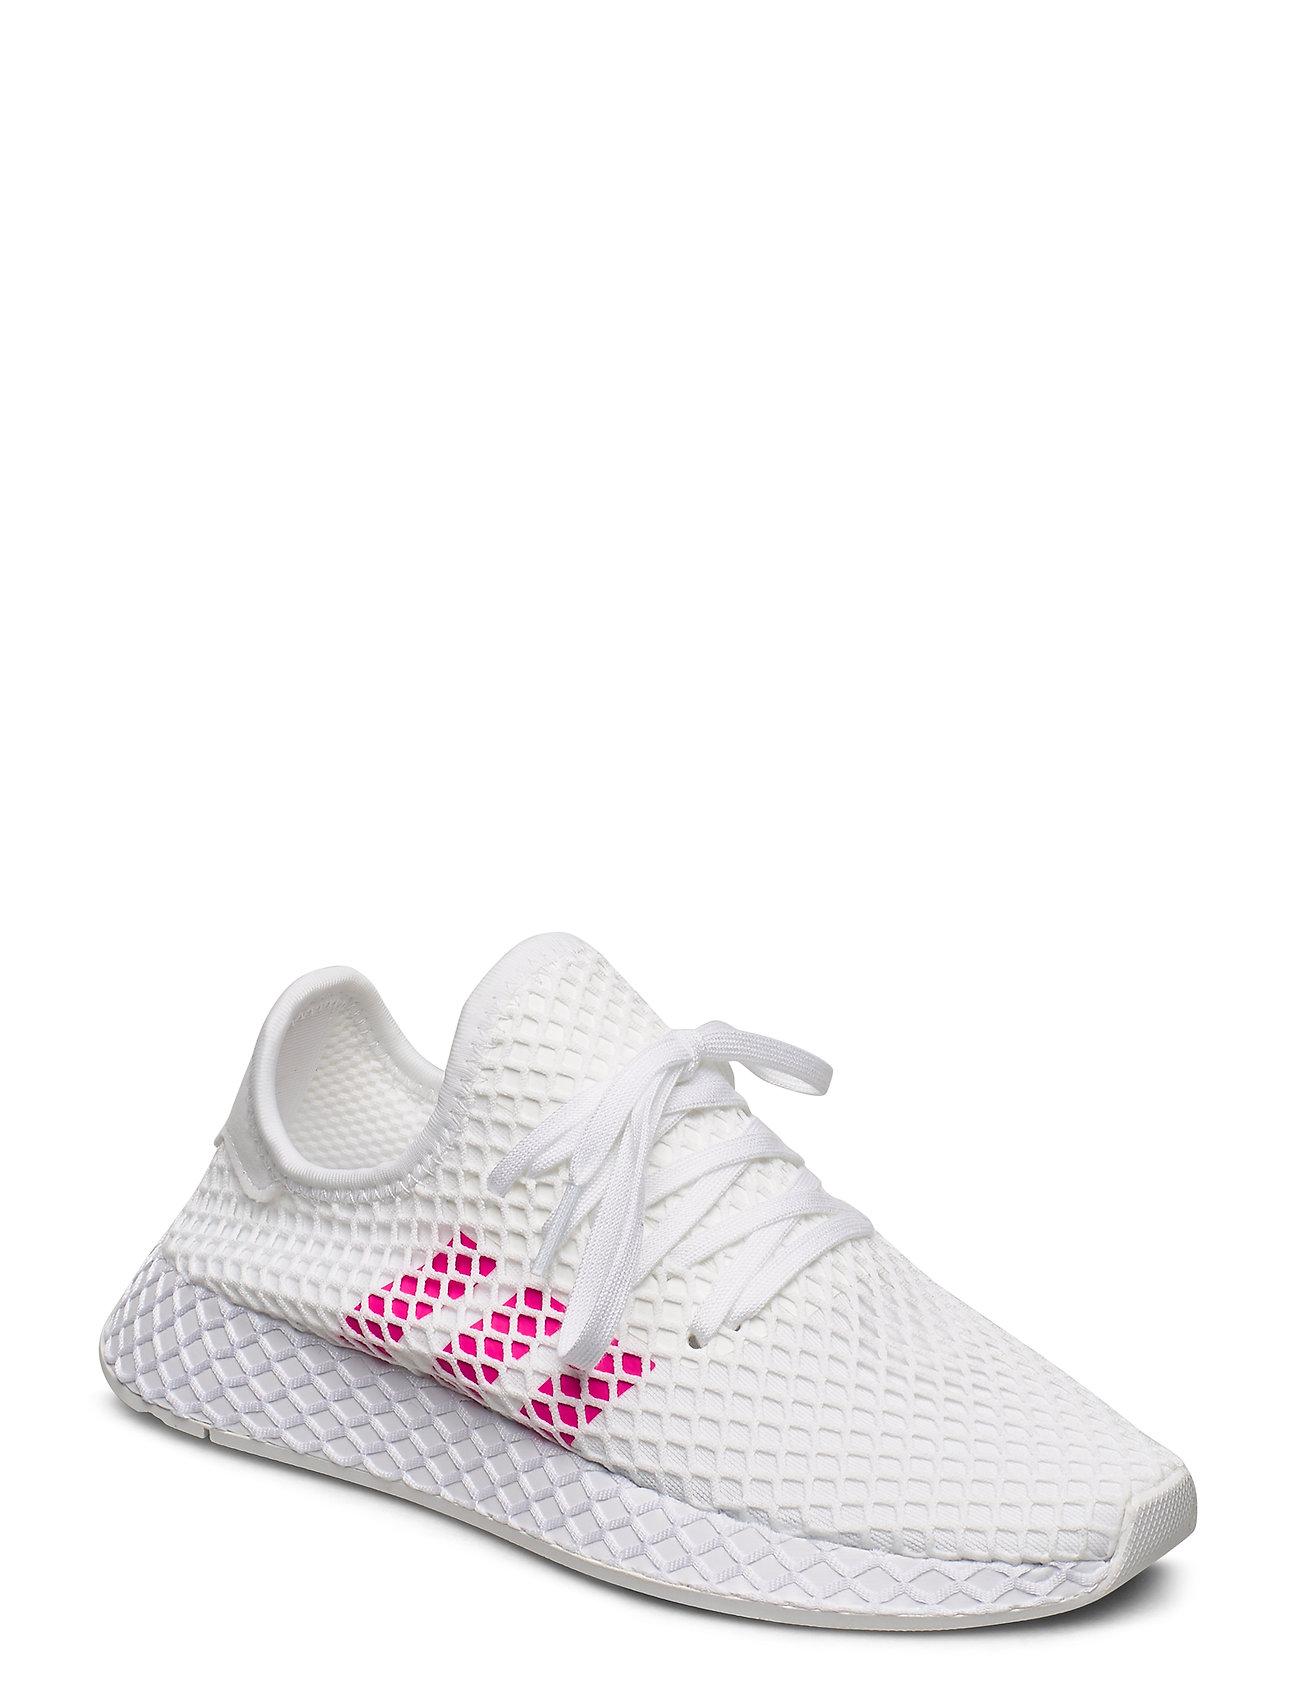 sencillo nada Vista  adidas Originals Deerupt Runner J (Ftwwht/shopnk/cblack), (45.47 €) | Large  selection of outlet-styles | Booztlet.com